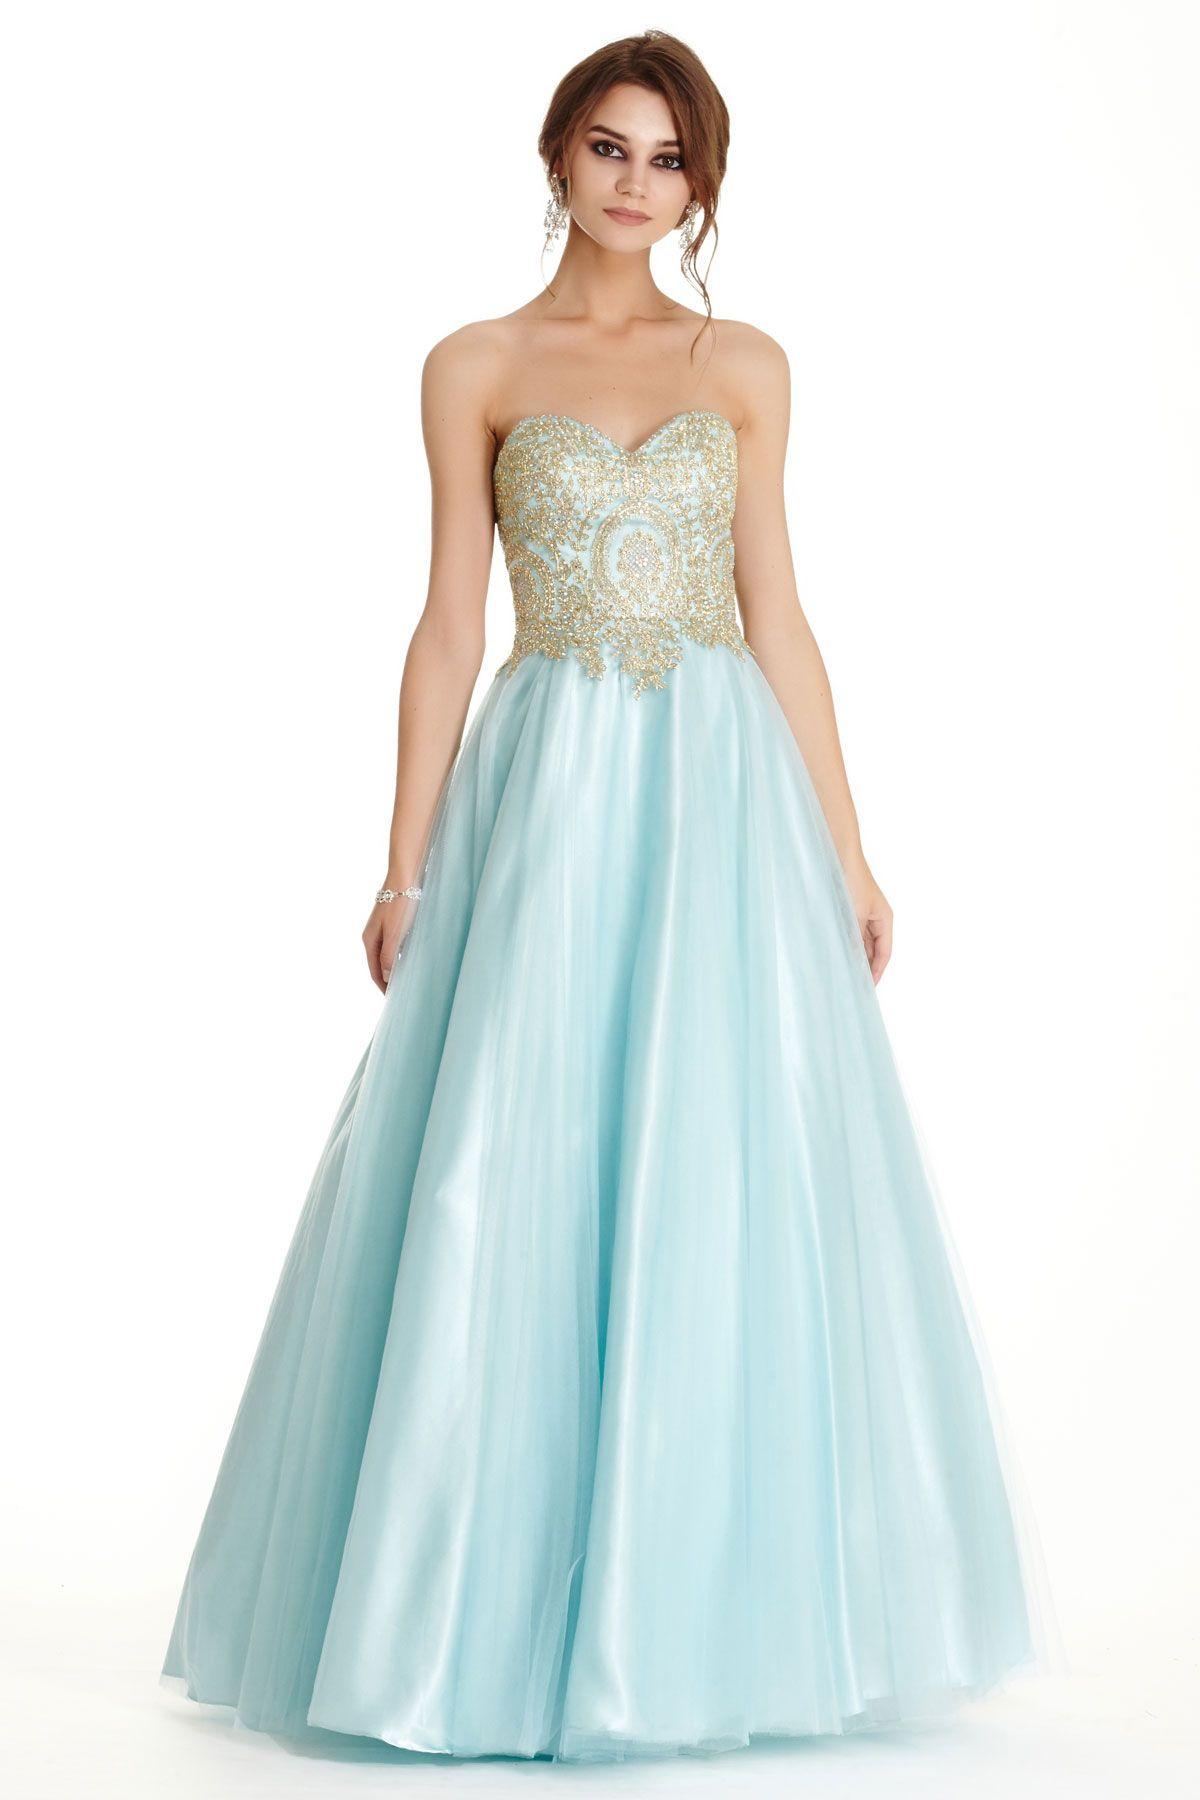 Prom Dress APL1885 https://www.smcfashion.com/wholesale-prom-dresses ...